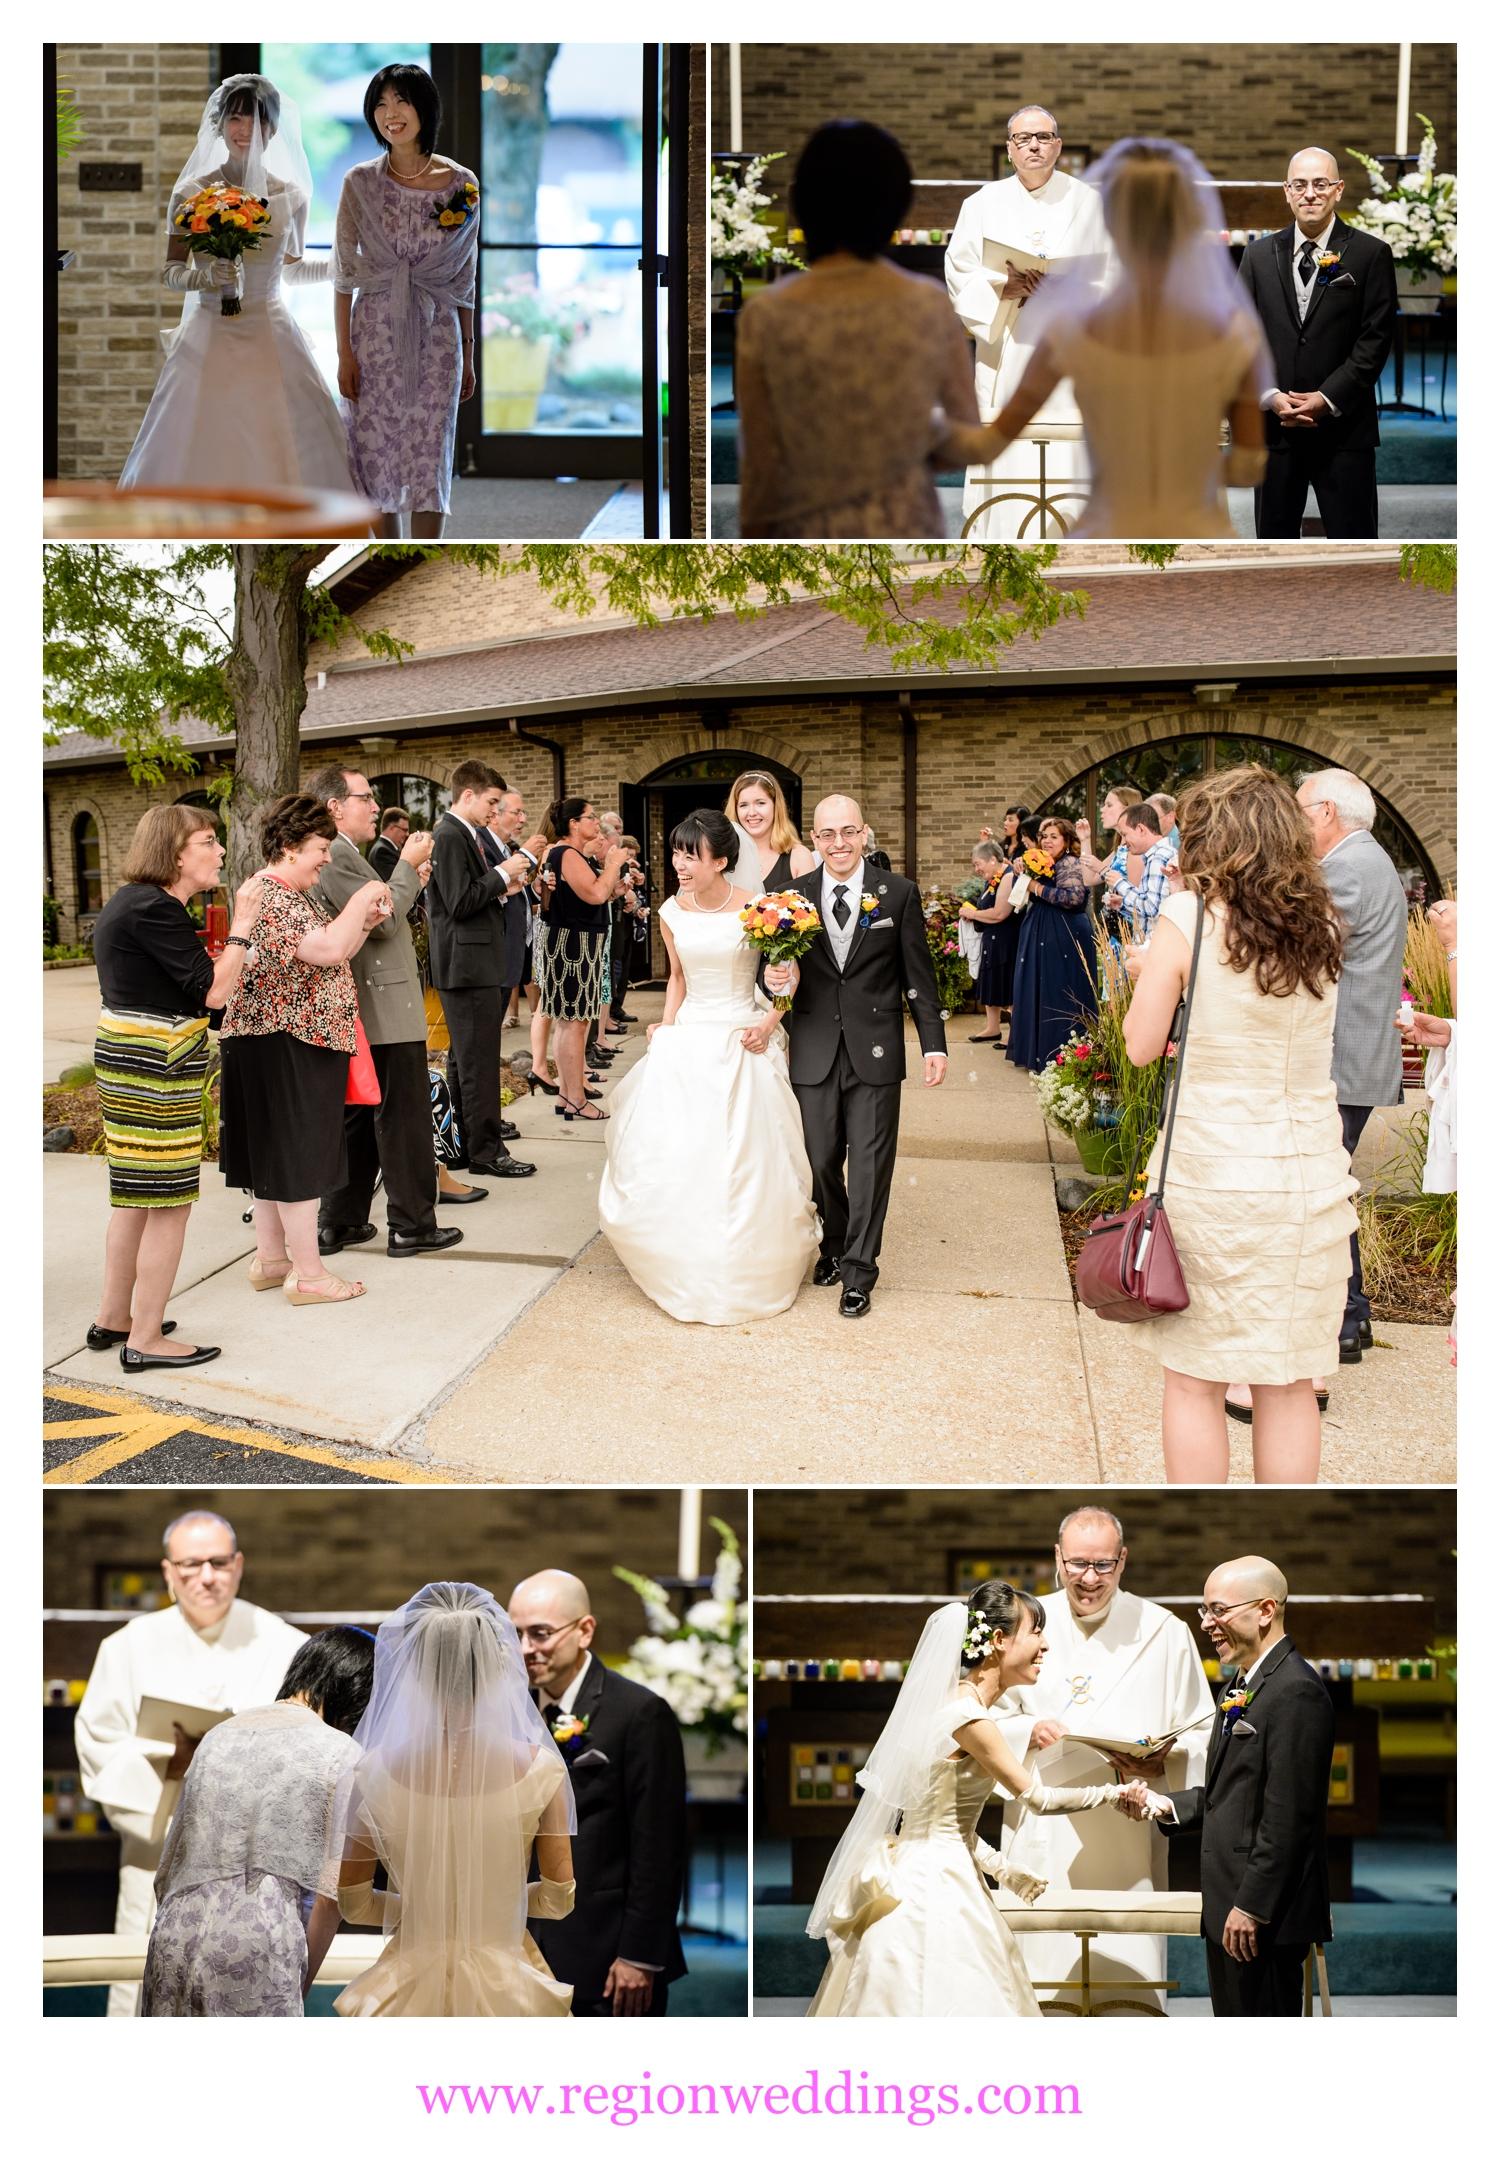 Wedding ceremony at St. Maria Goretti Church.